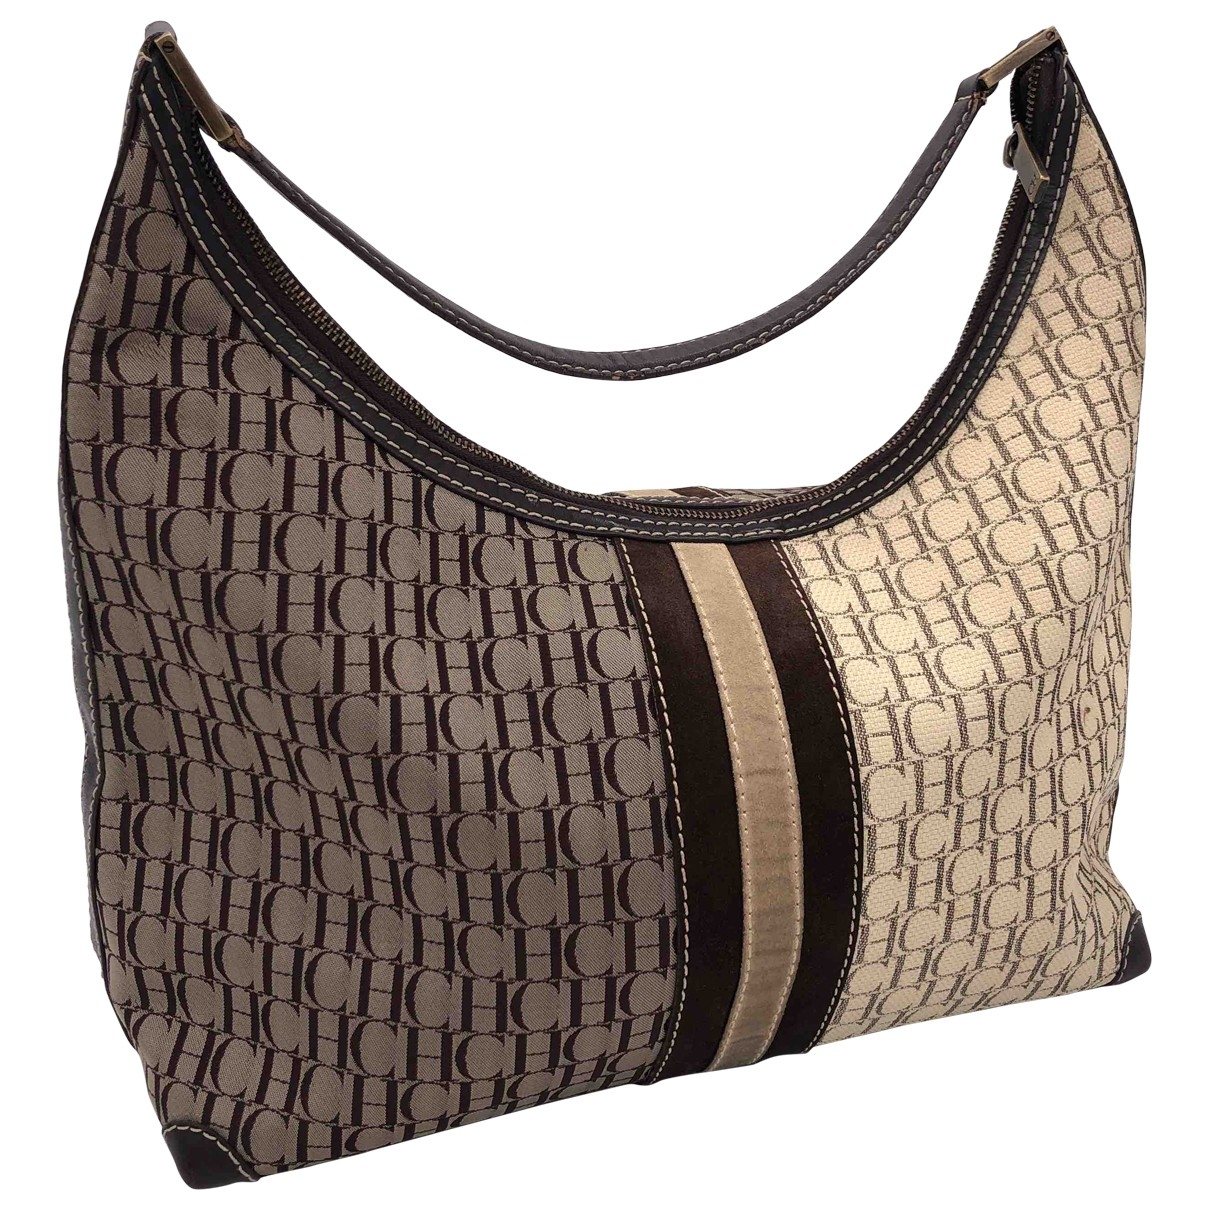 Carolina Herrera \N Brown Cloth handbag for Women \N